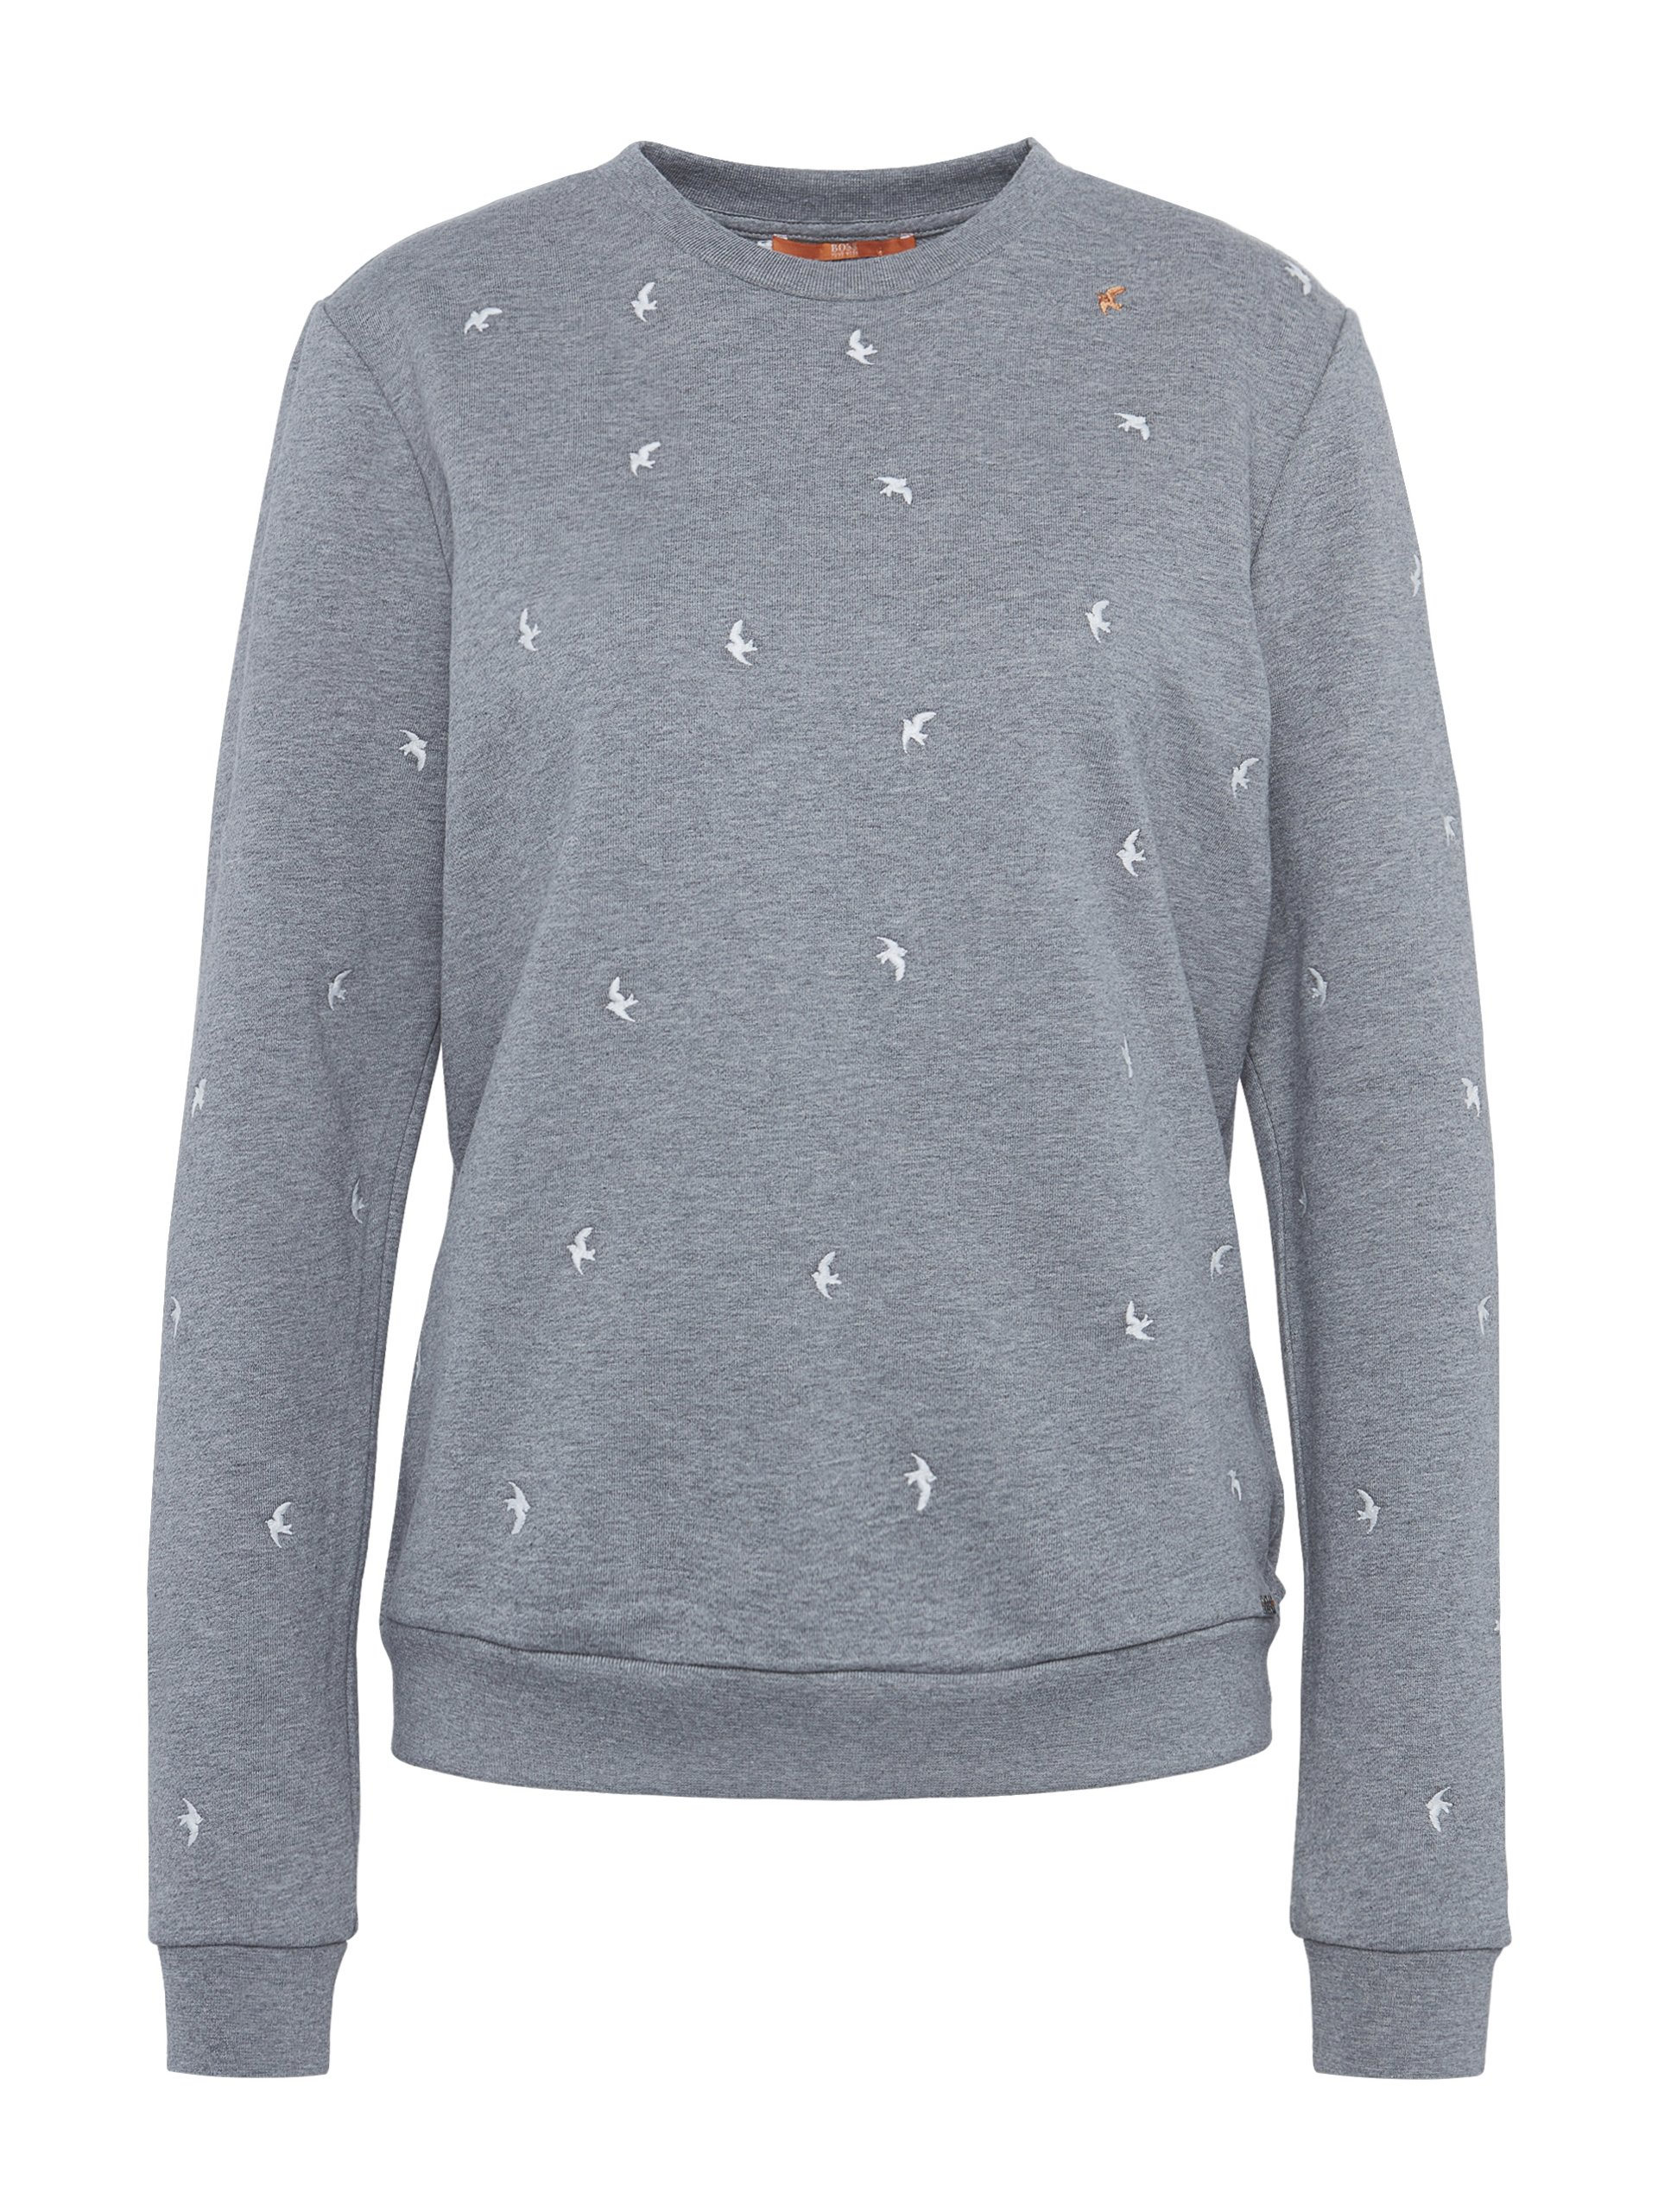 BOSS Casual Damska bluza nierozpinana – Tabirdy